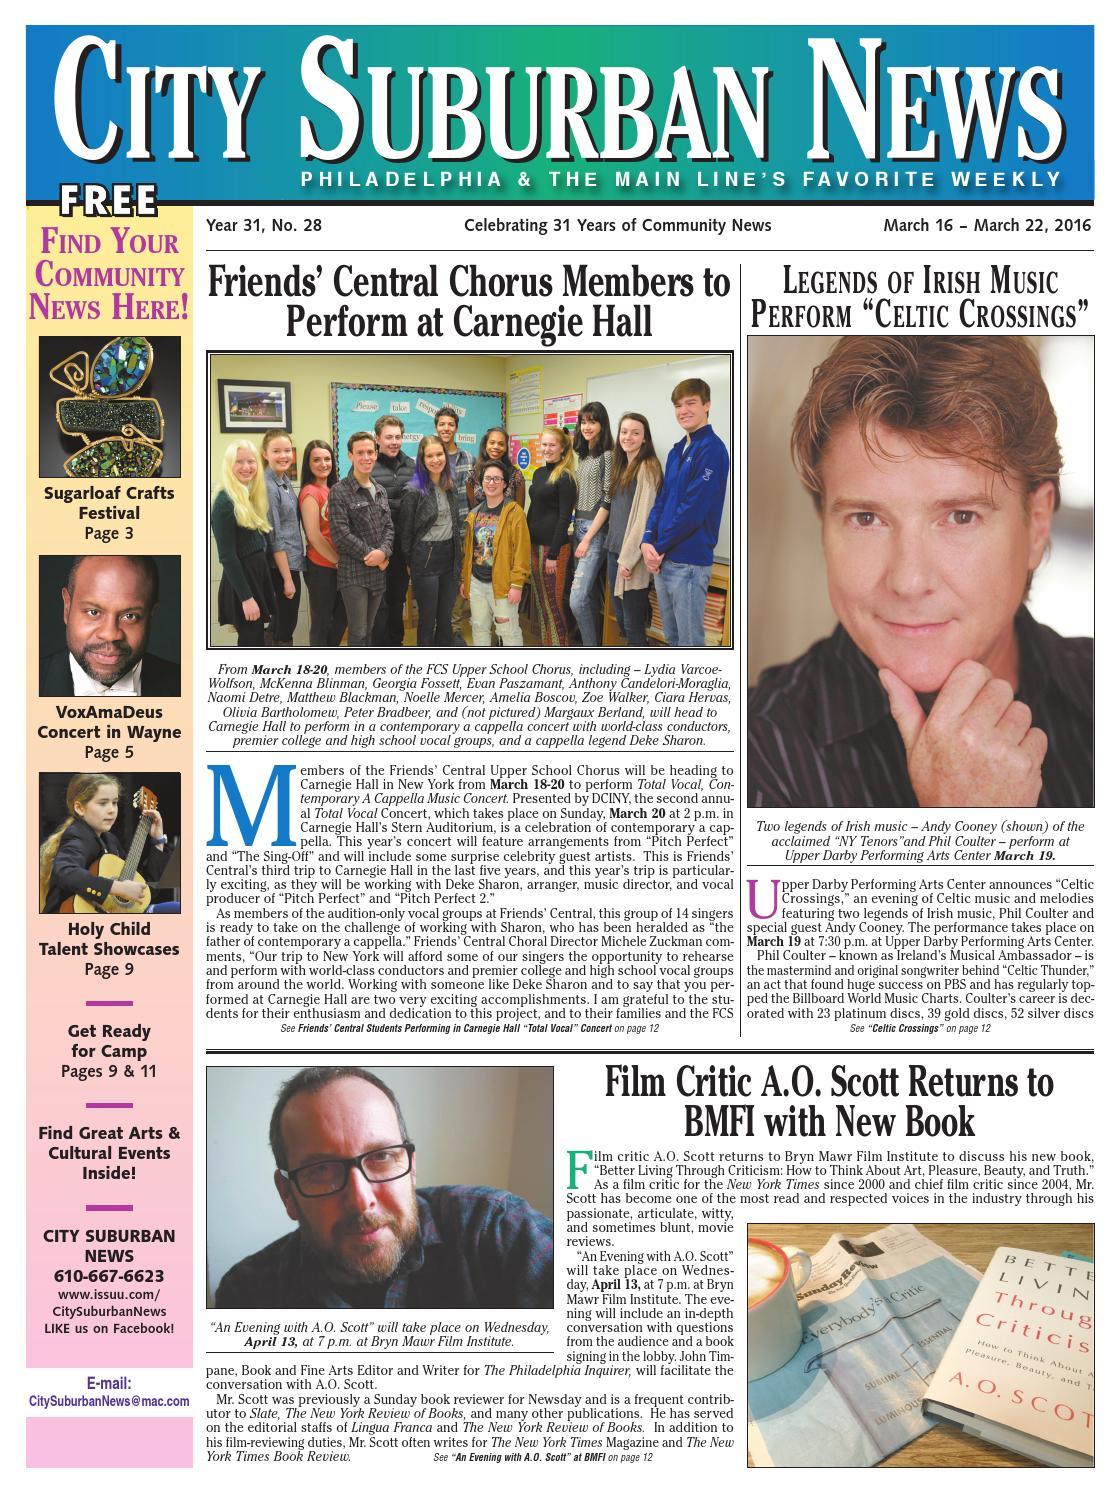 City Suburban News 3_16_16 issue by City Suburban News - issuu